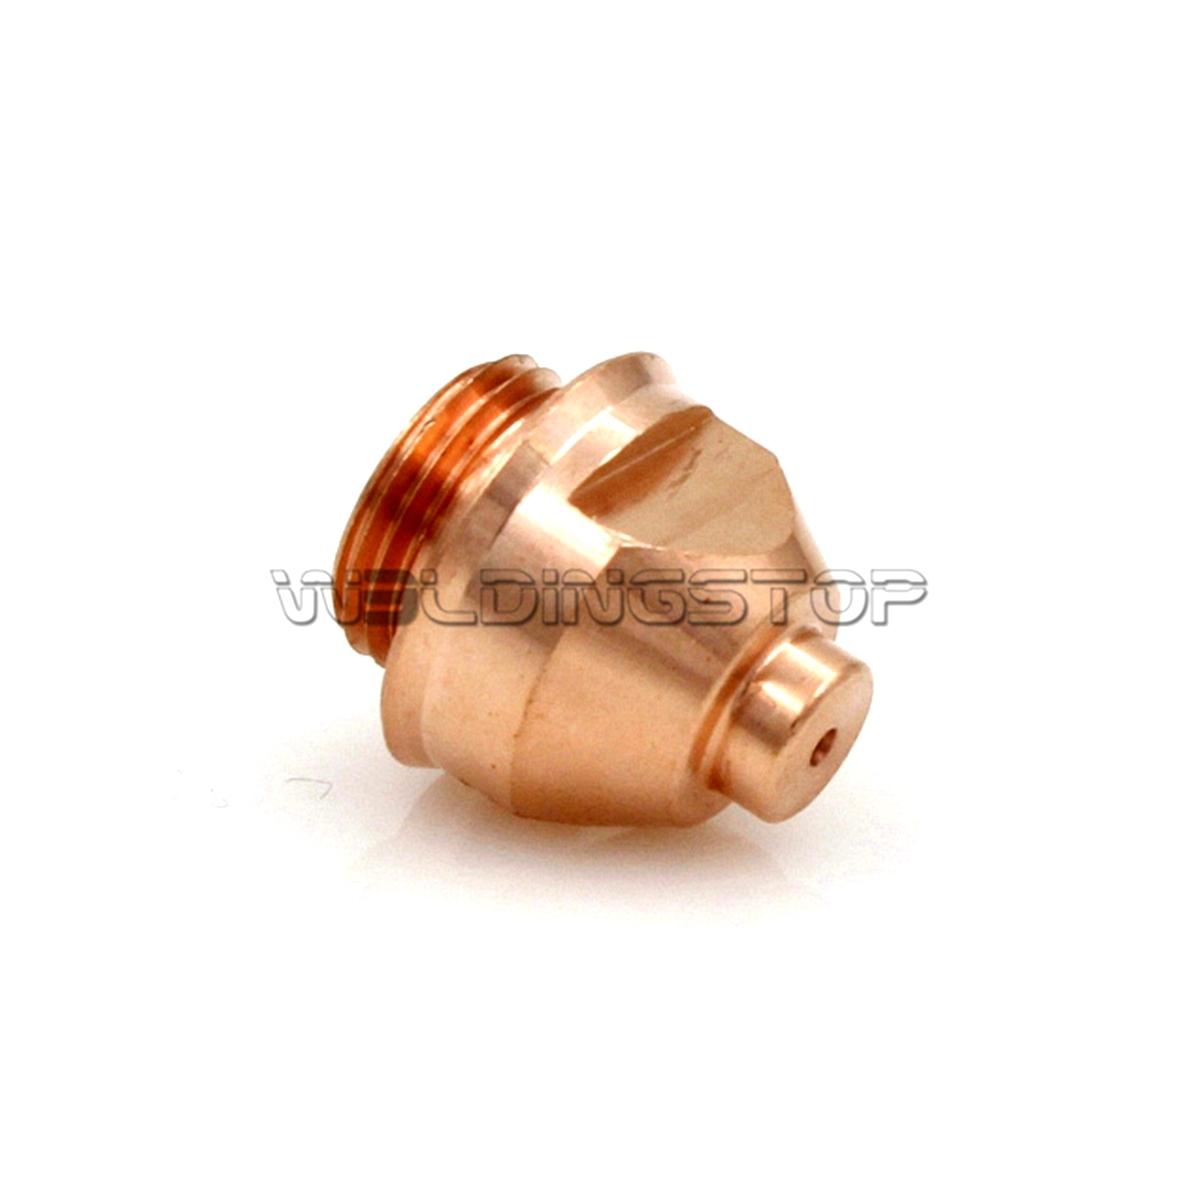 Thermal Dynamics PCH 51 3XR 4XI 5XR of 9-5633 9-5631 8-5526 Plasma Electrode Tip